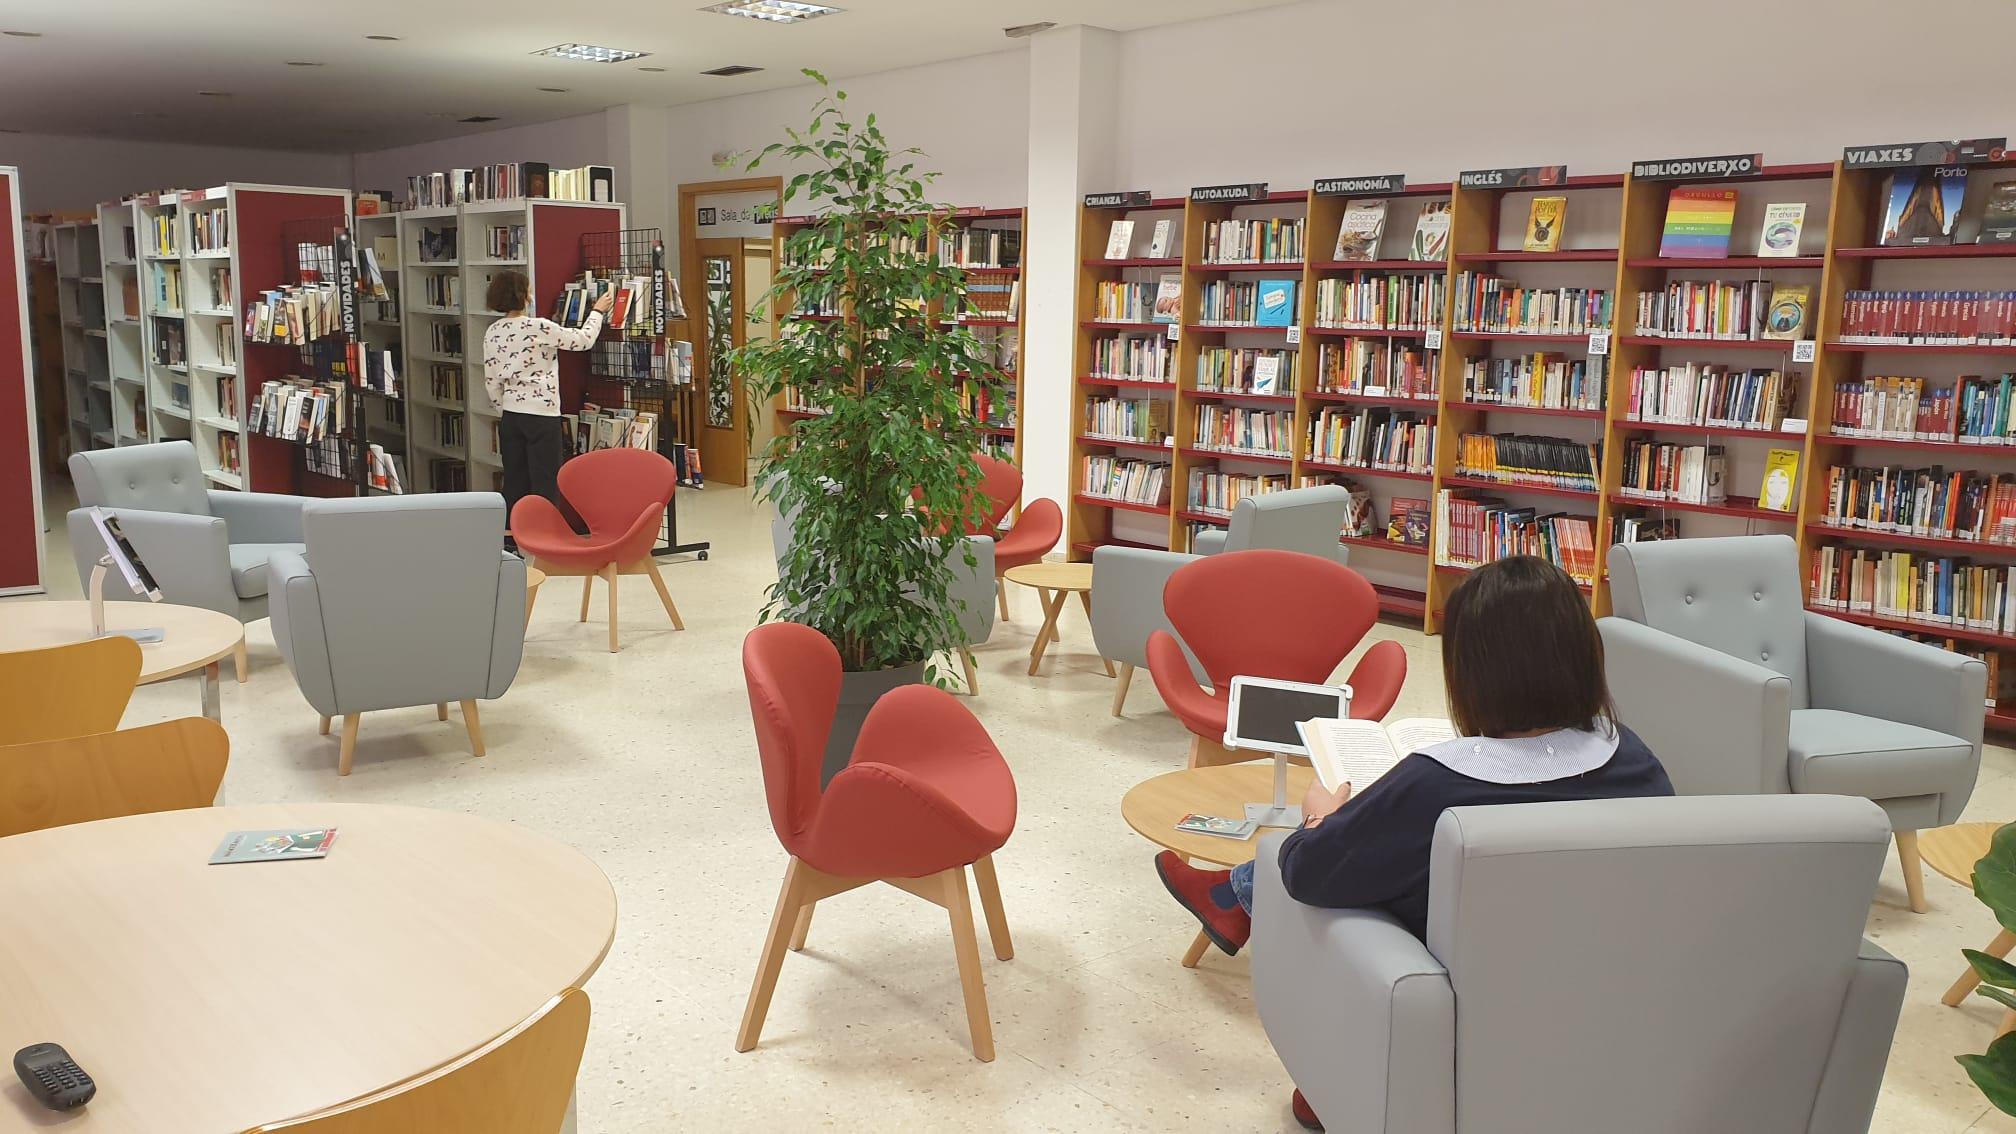 Reapertura da biblioteca do Porriño: unha biblioteca sempre na vangarda